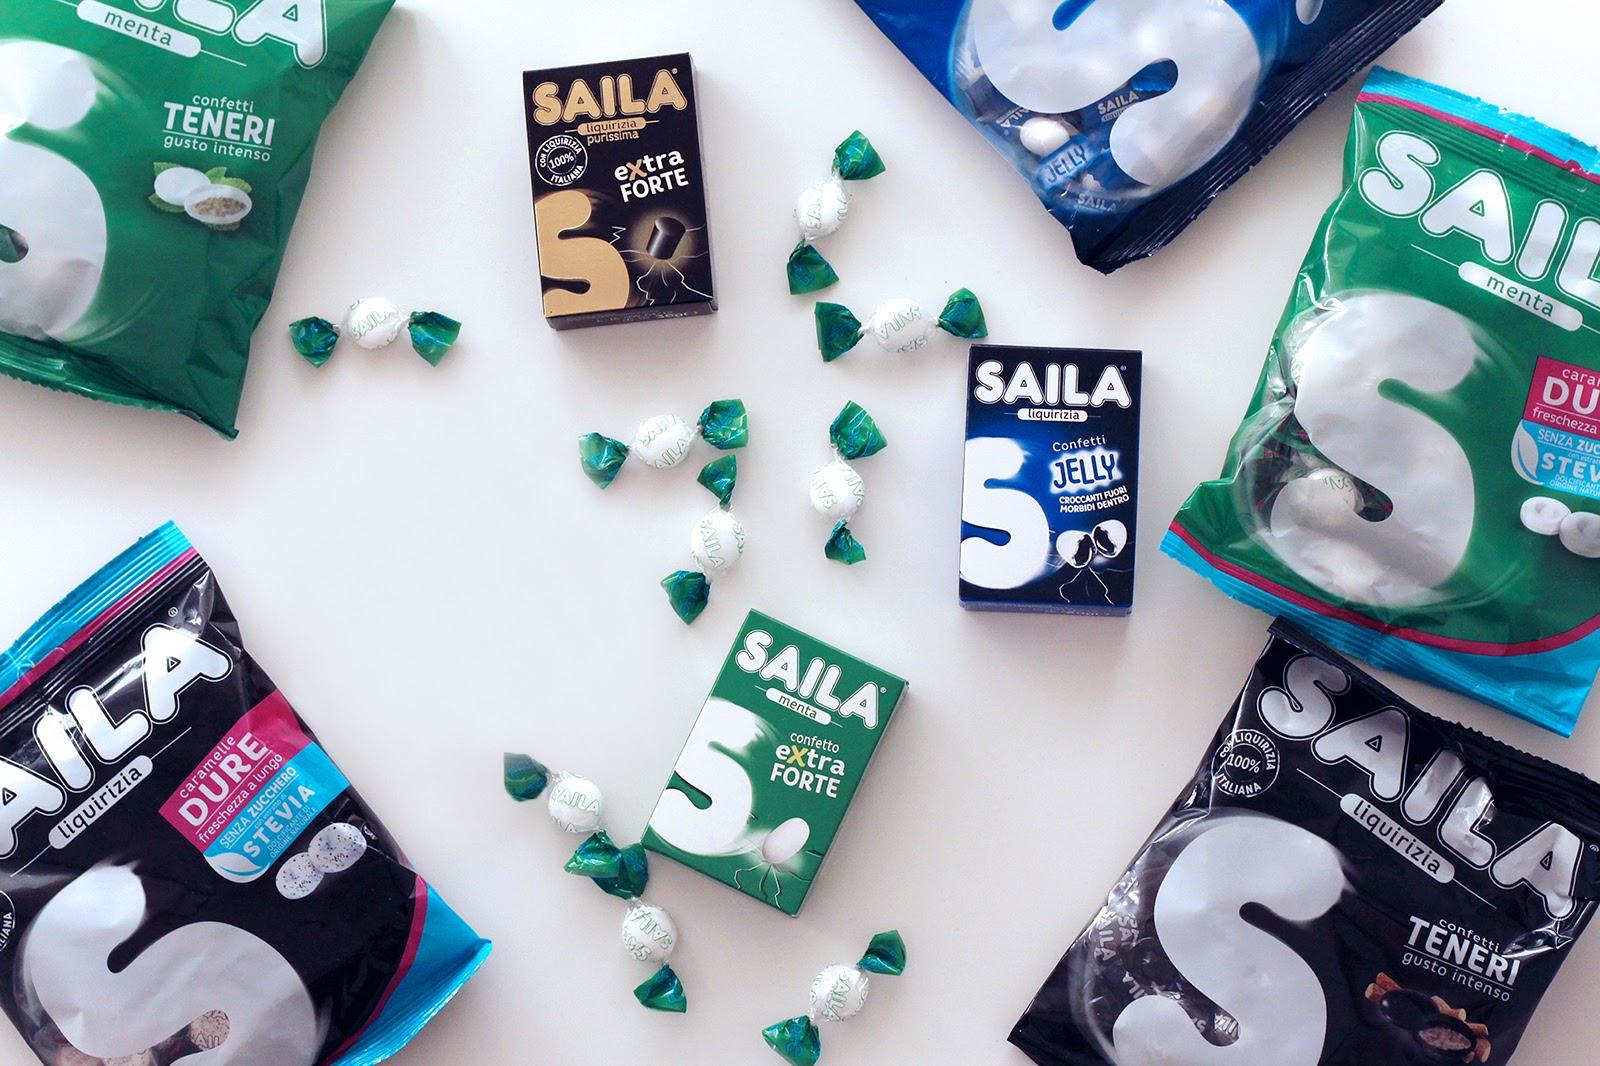 Le nuove caramelle saila gusto liquirizia e menta